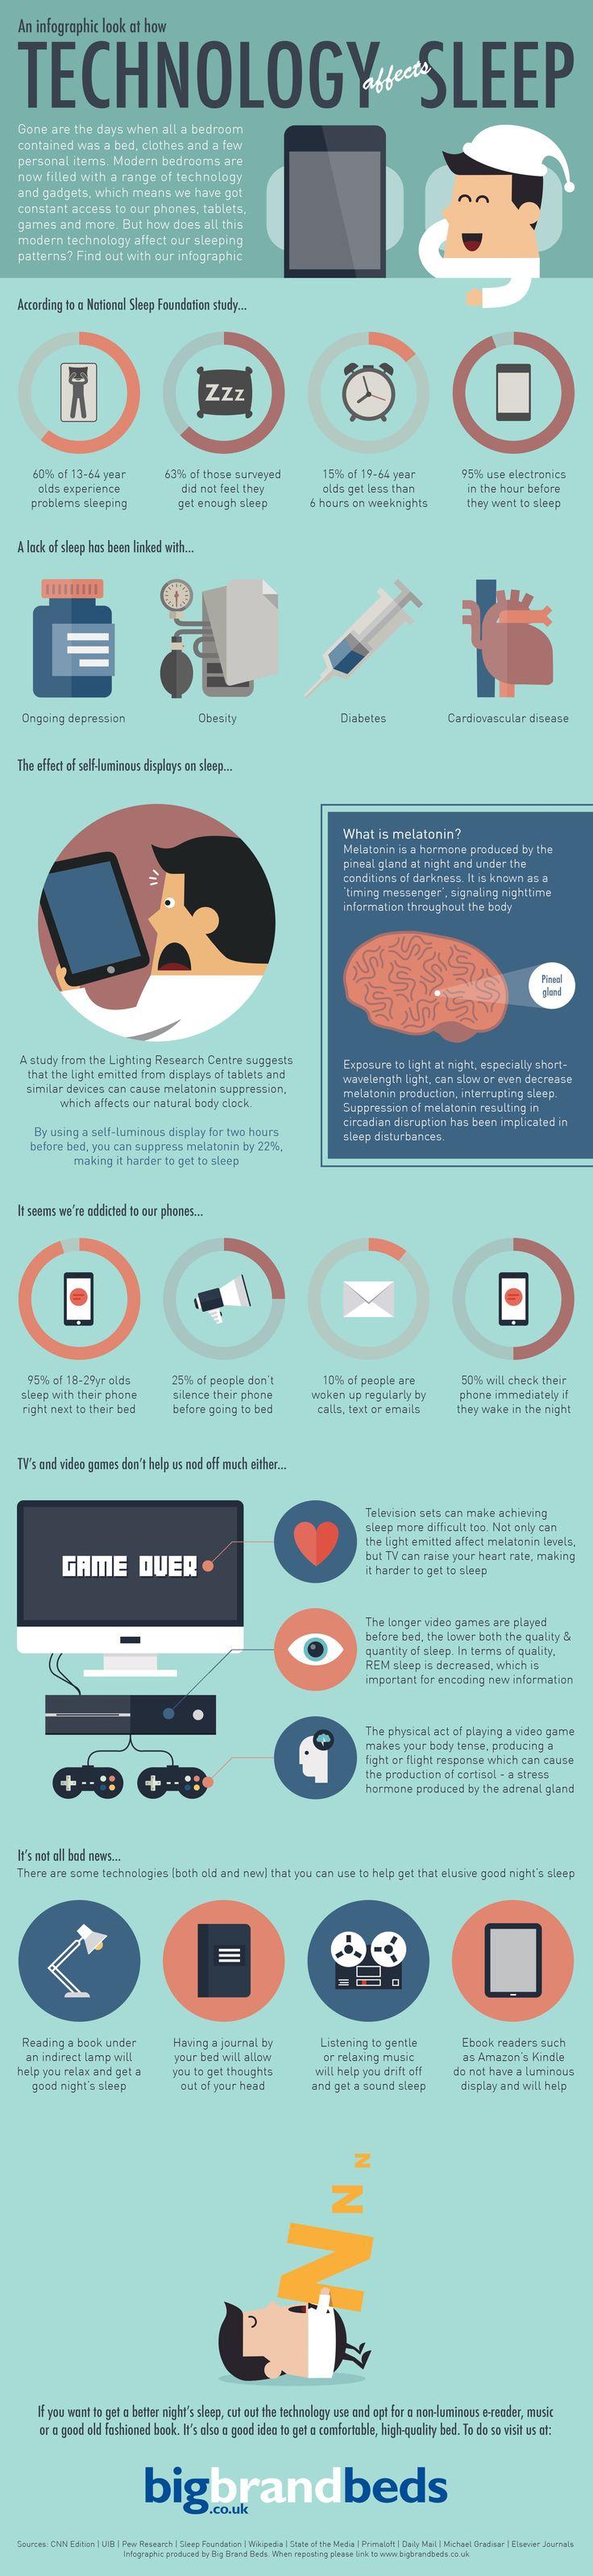 How Technology Affects Sleep #infographic #Technology #Sleep #Health